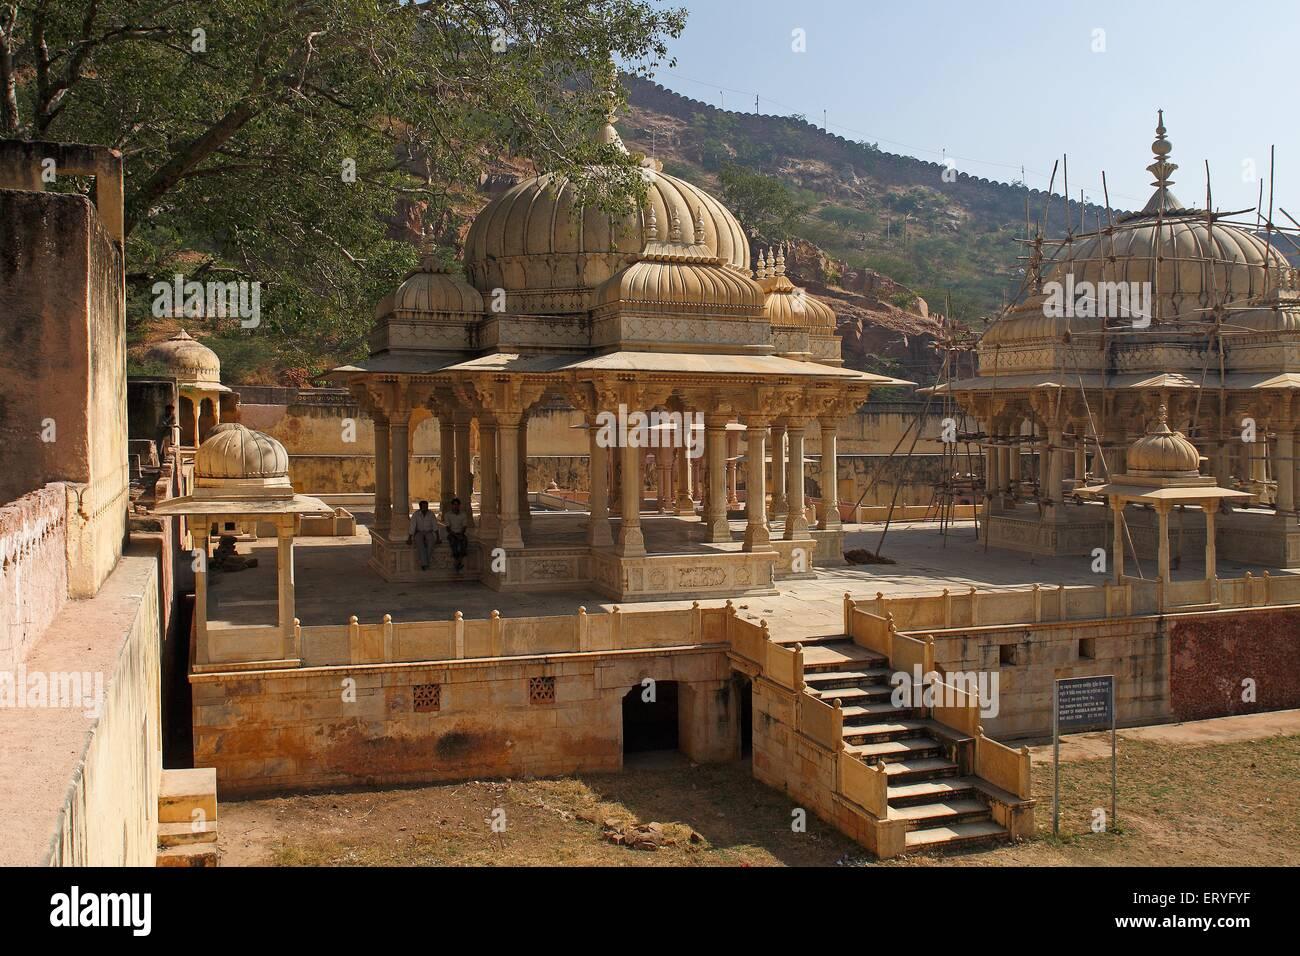 Sawai jai singh cenotaph royal getore gaitor ; Jaipur ; Rajasthan ; India - Stock Image